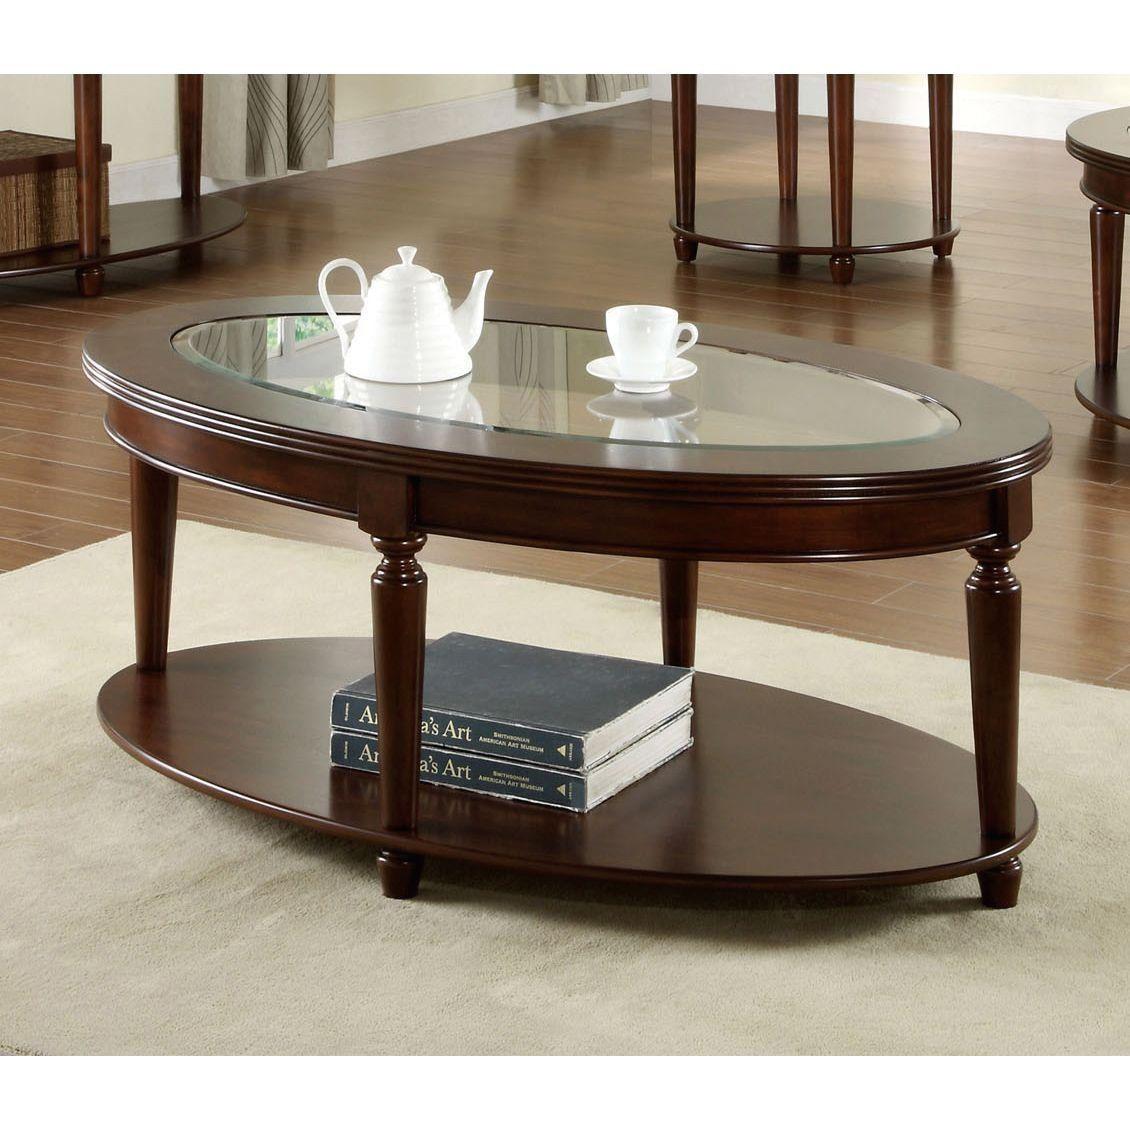 Furniture Of America Crescent Dark Cherry Glass Top Oval Coffee Table Glass Veneer Dark Cherry Bro Coffee Table Wood Cherry Wood Coffee Table Coffee Table [ 1130 x 1130 Pixel ]